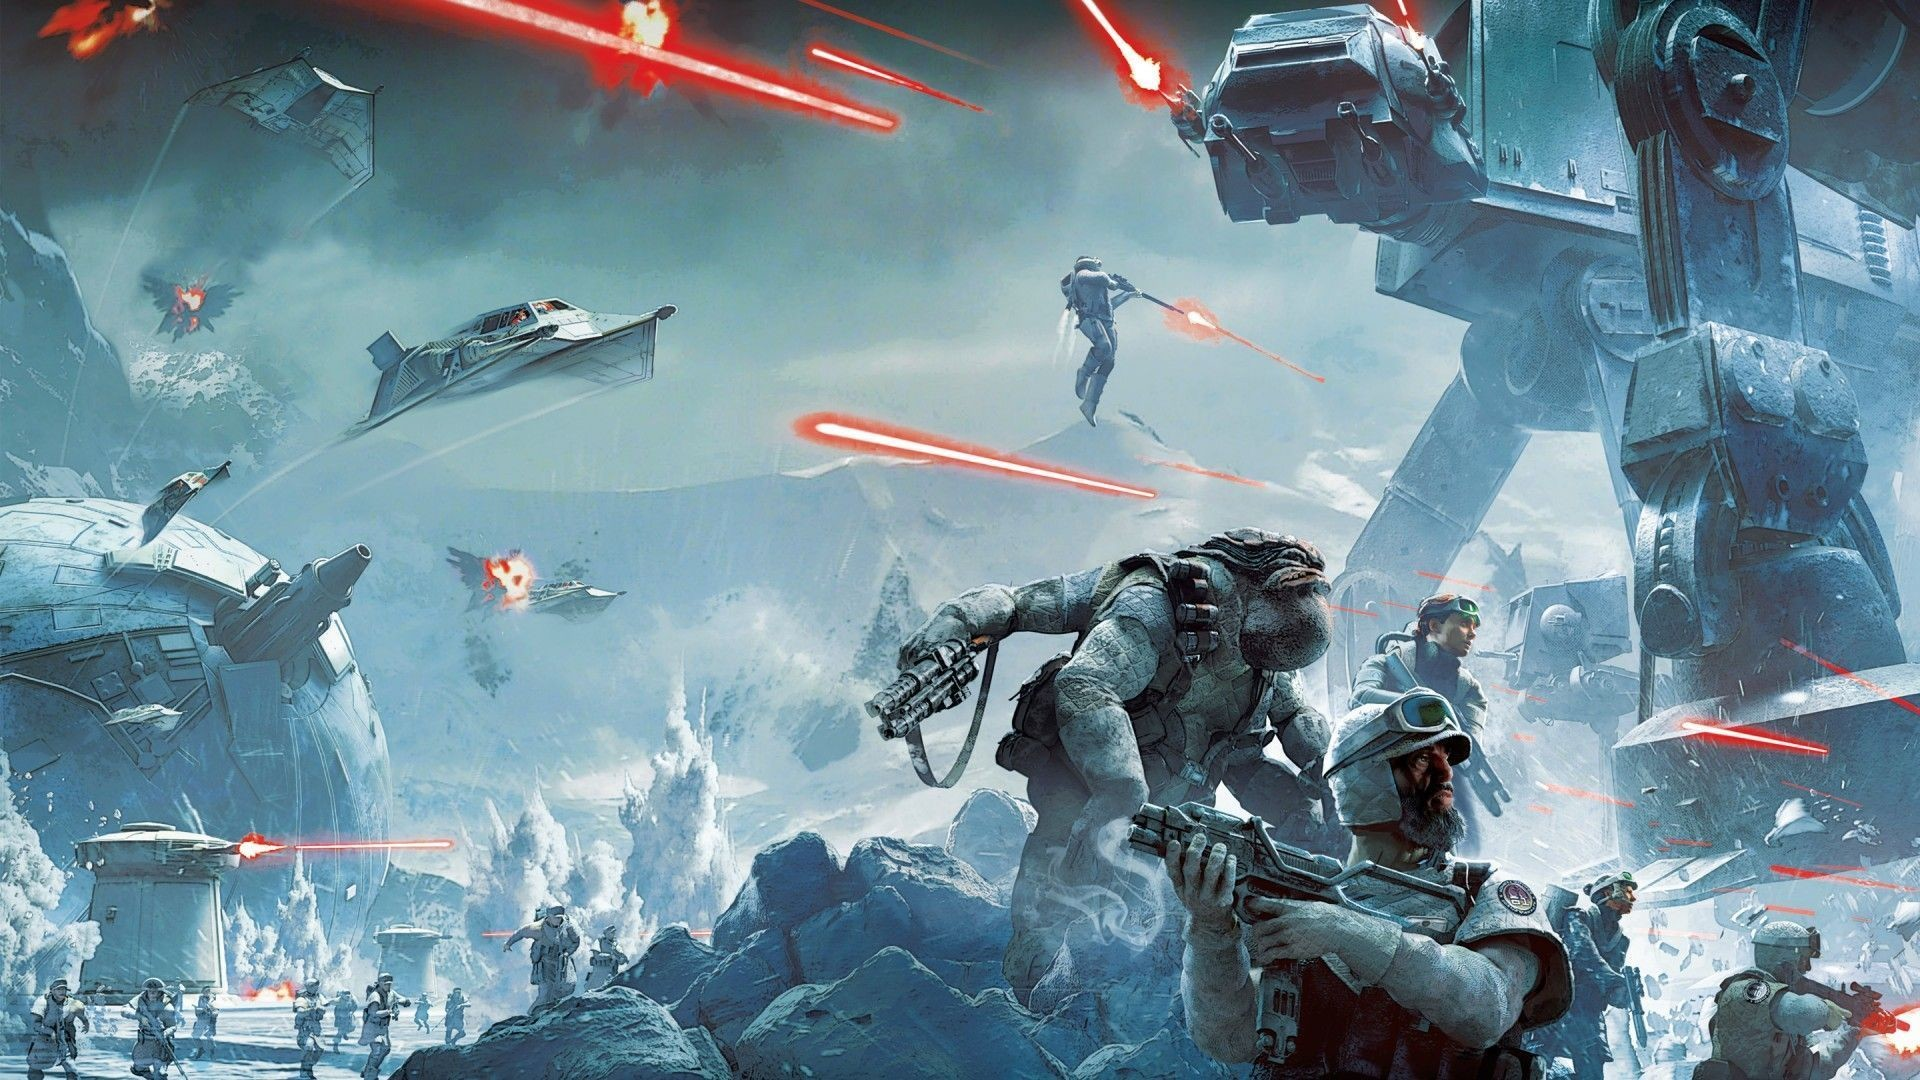 Star Wars Battlefront (1080p) – Wallpaper – Wallpaper Style